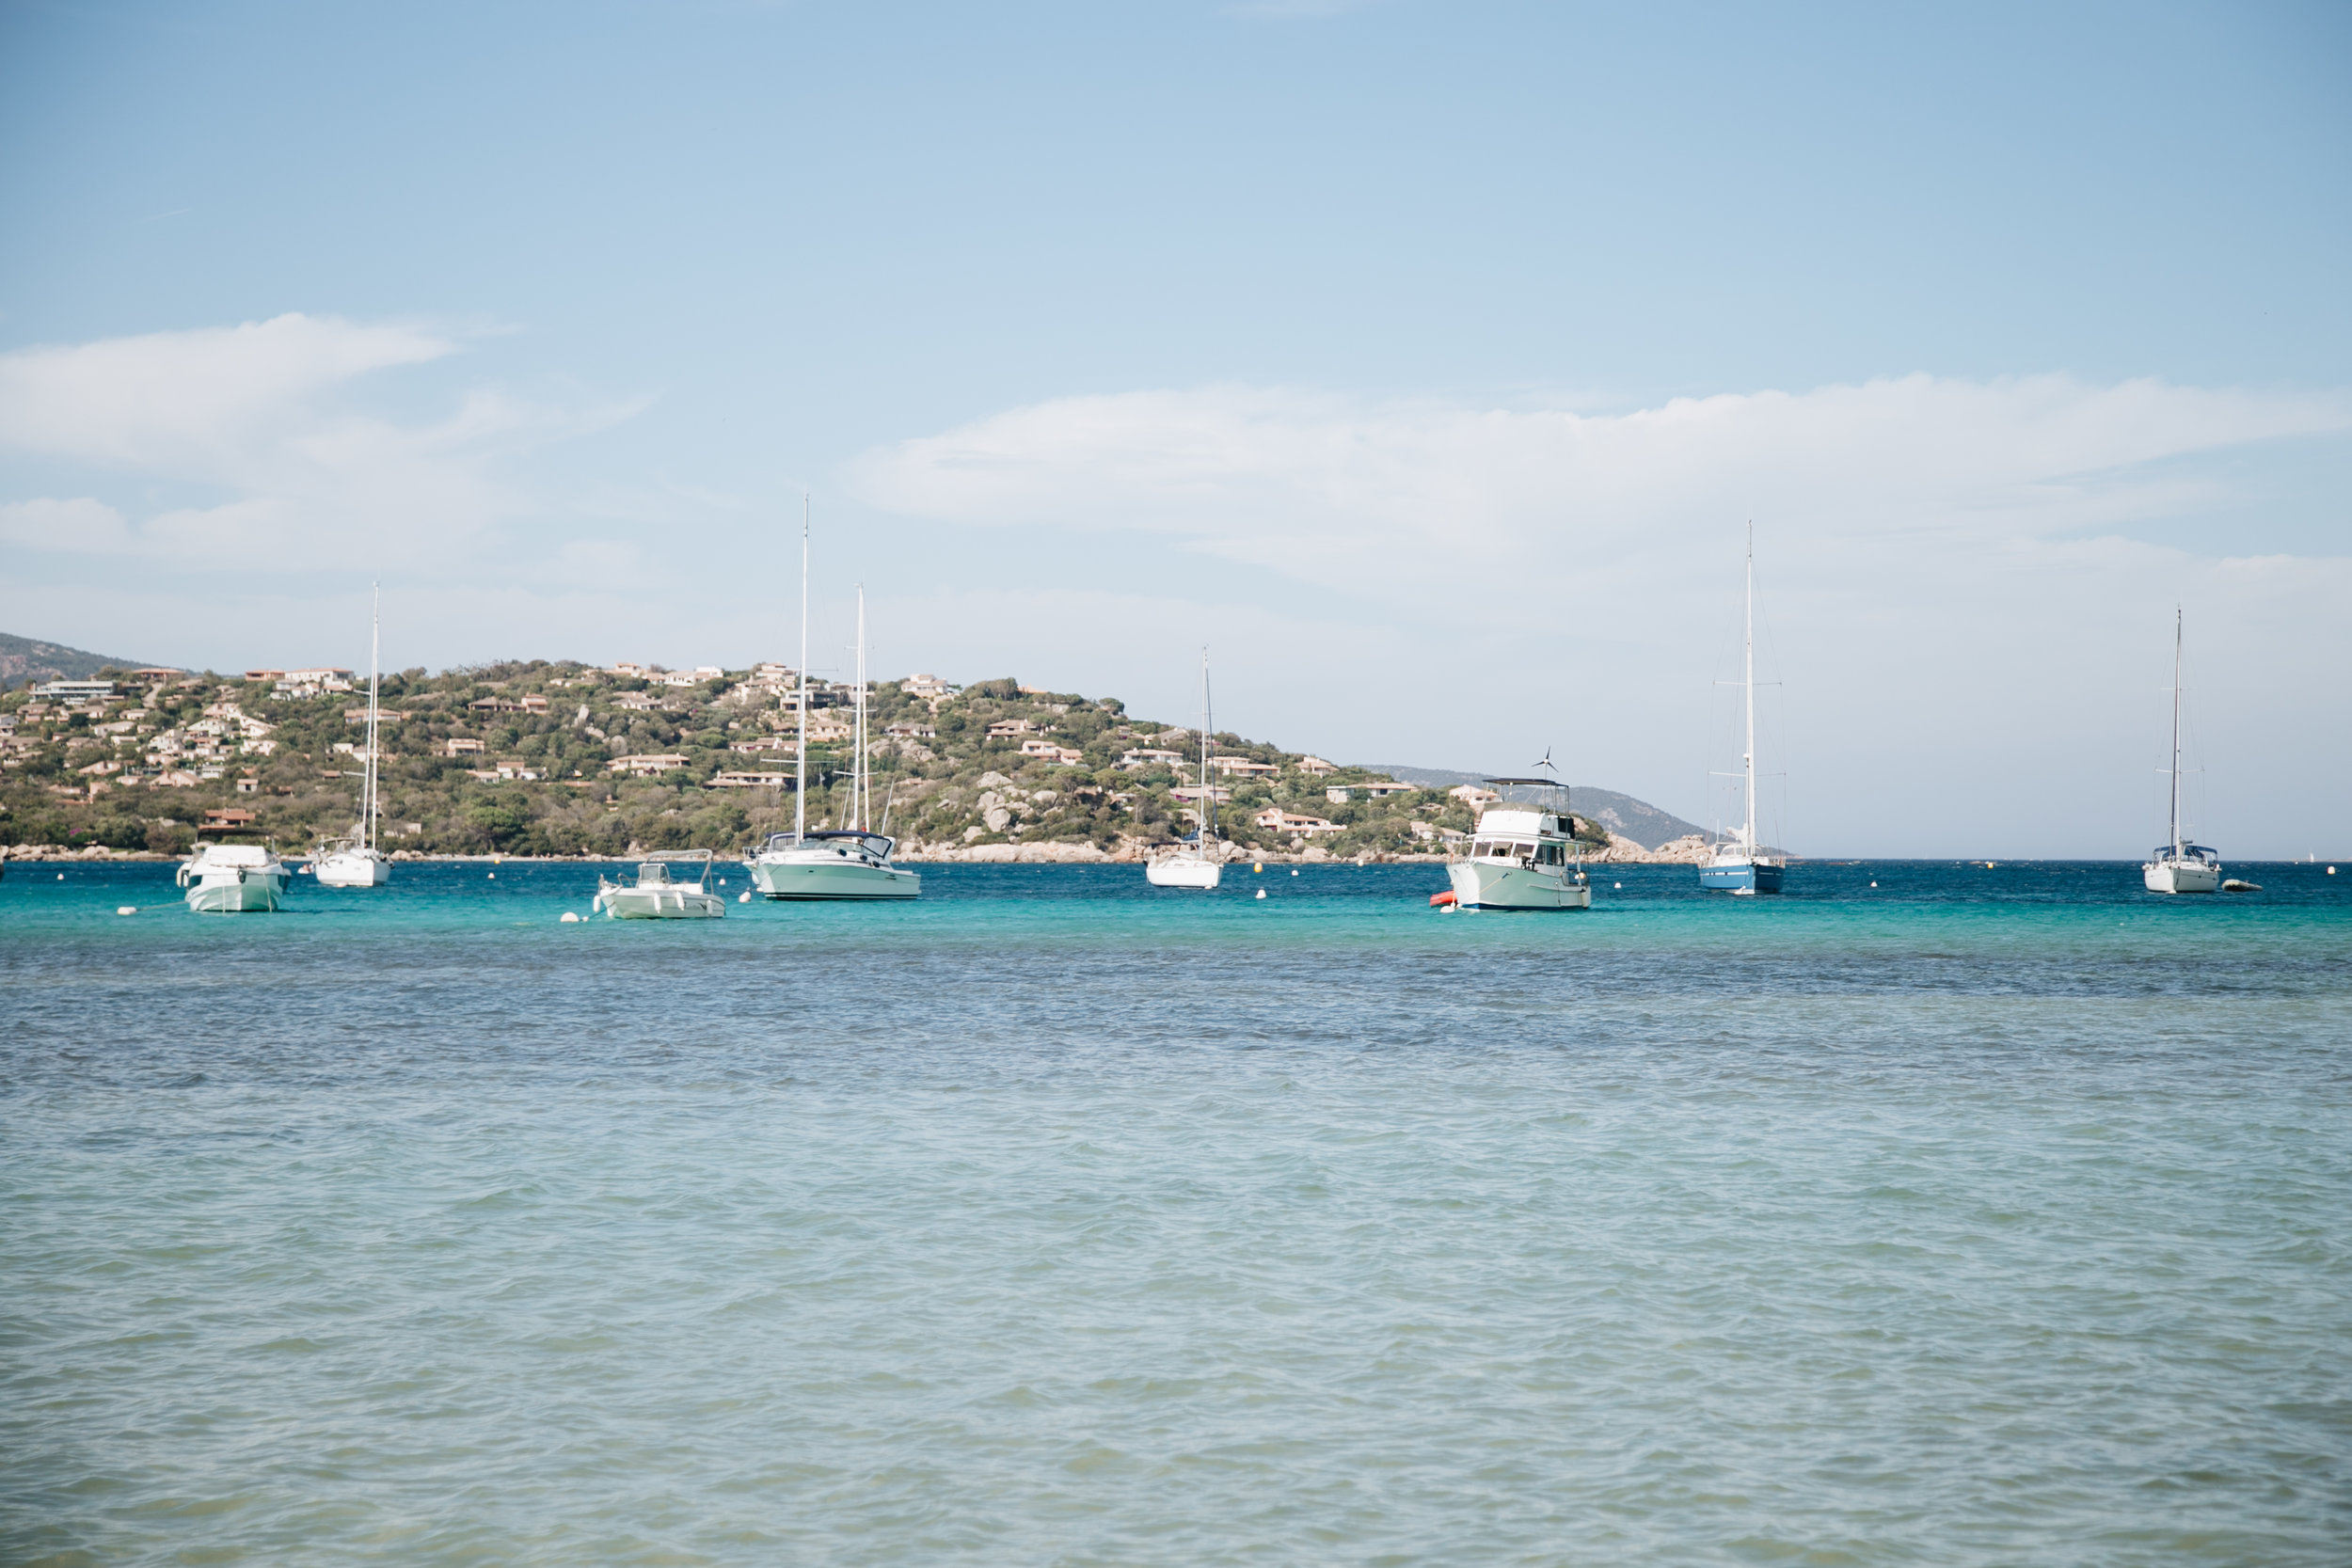 yachts-santa-giulia-beach-corsica.jpg